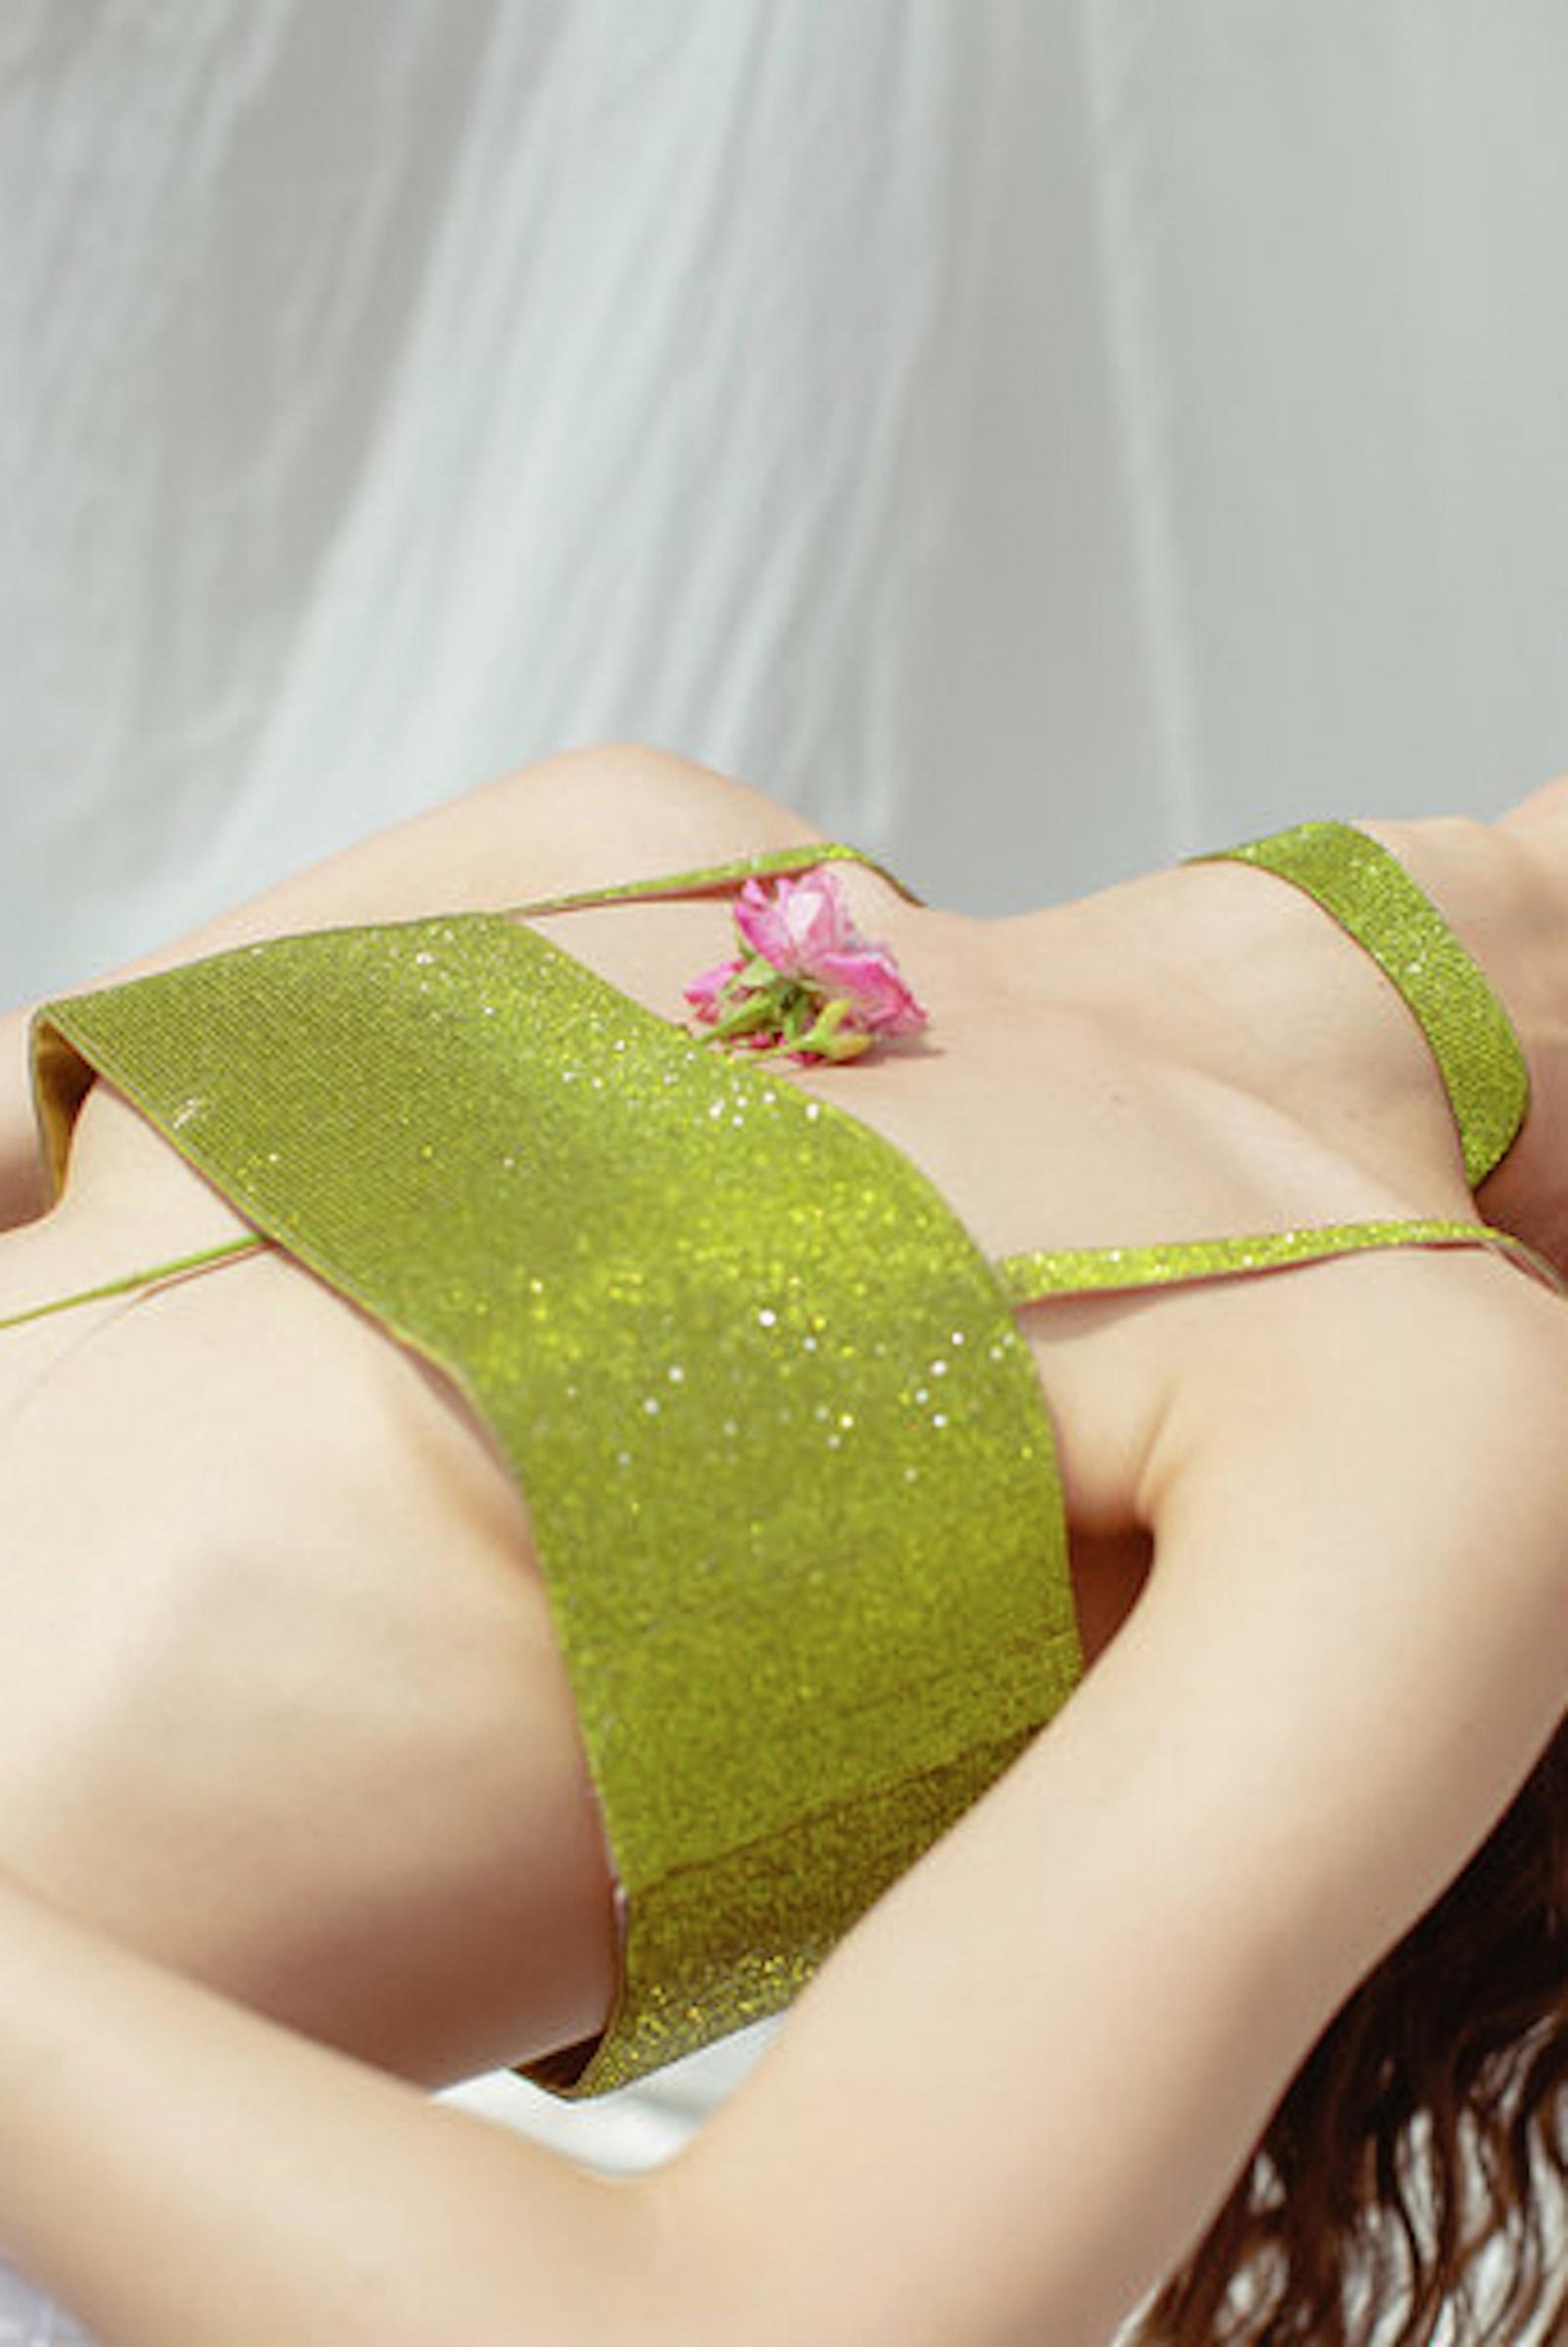 Nué Studio Brand Interview Ukrainian Brand Evening wear Party Glitter Top Collection COVID-19